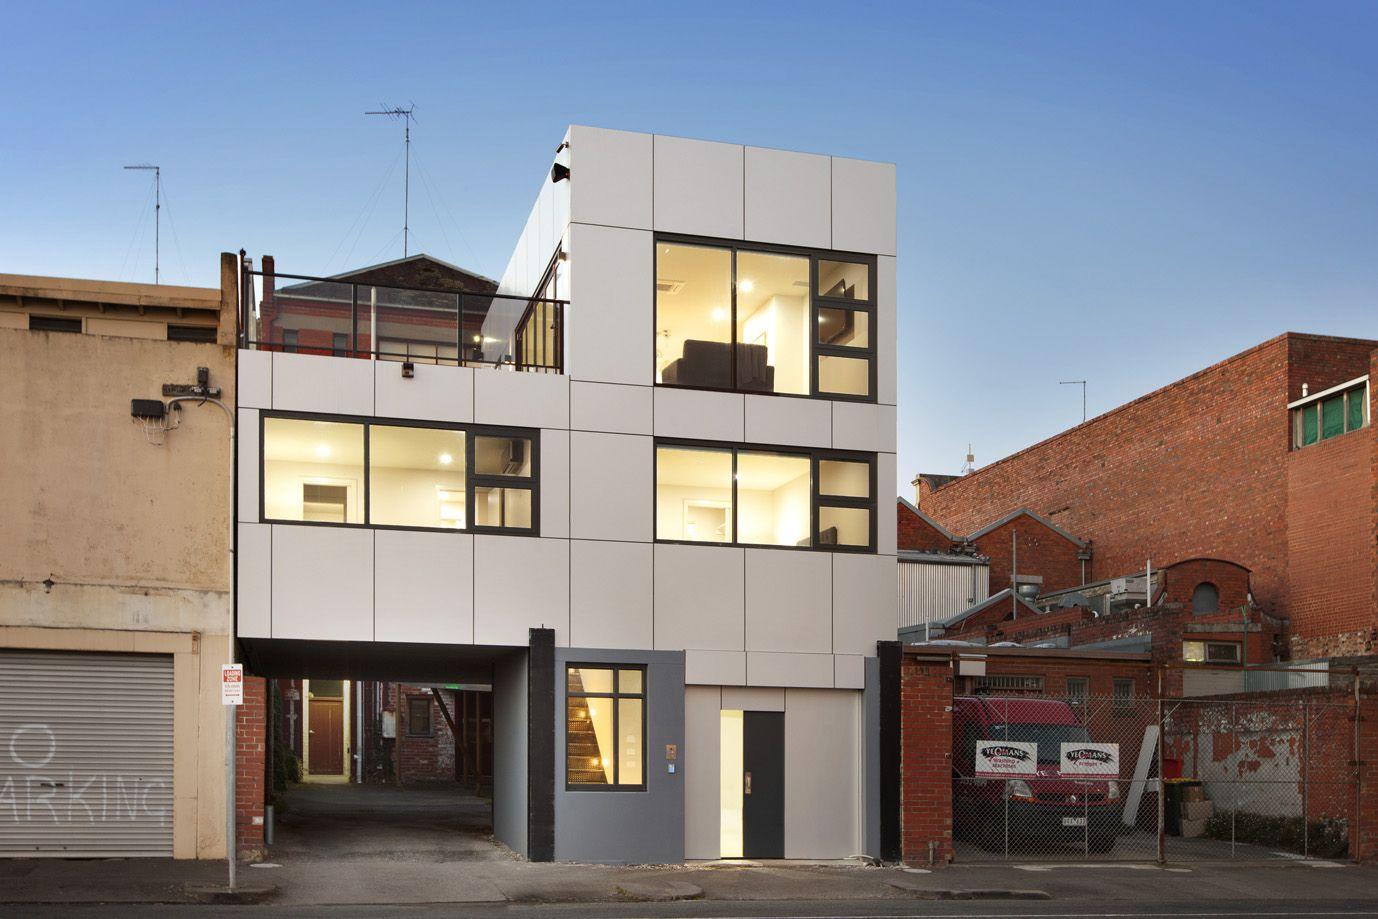 4/11 Lewis Street, Ballarat Central VIC 3350, Image 1